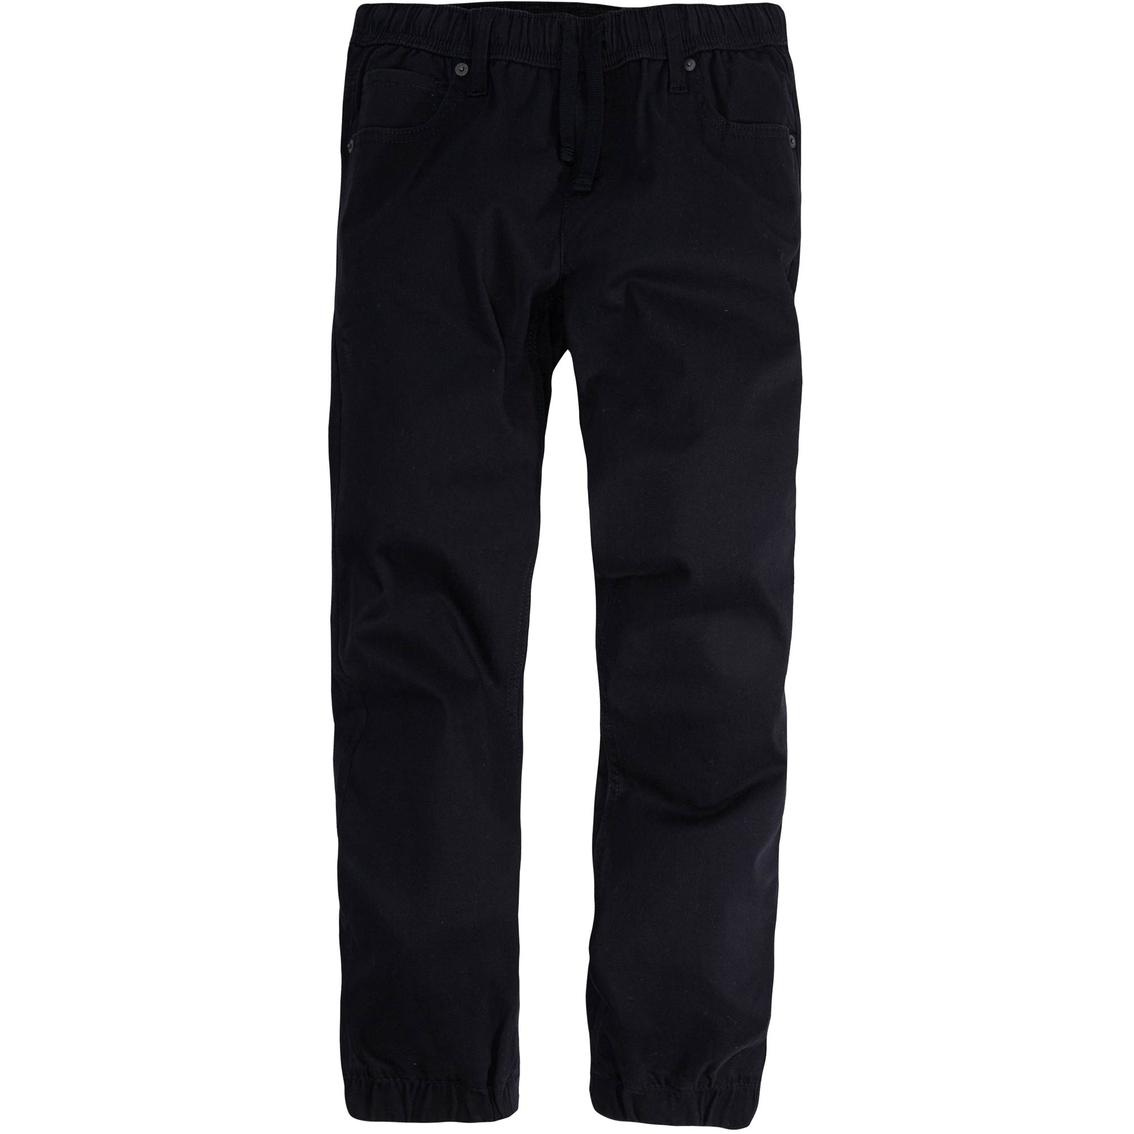 3493538ad Levi's Boys Chino Jogger Pants | Boys 8-20 | Apparel | Shop The Exchange